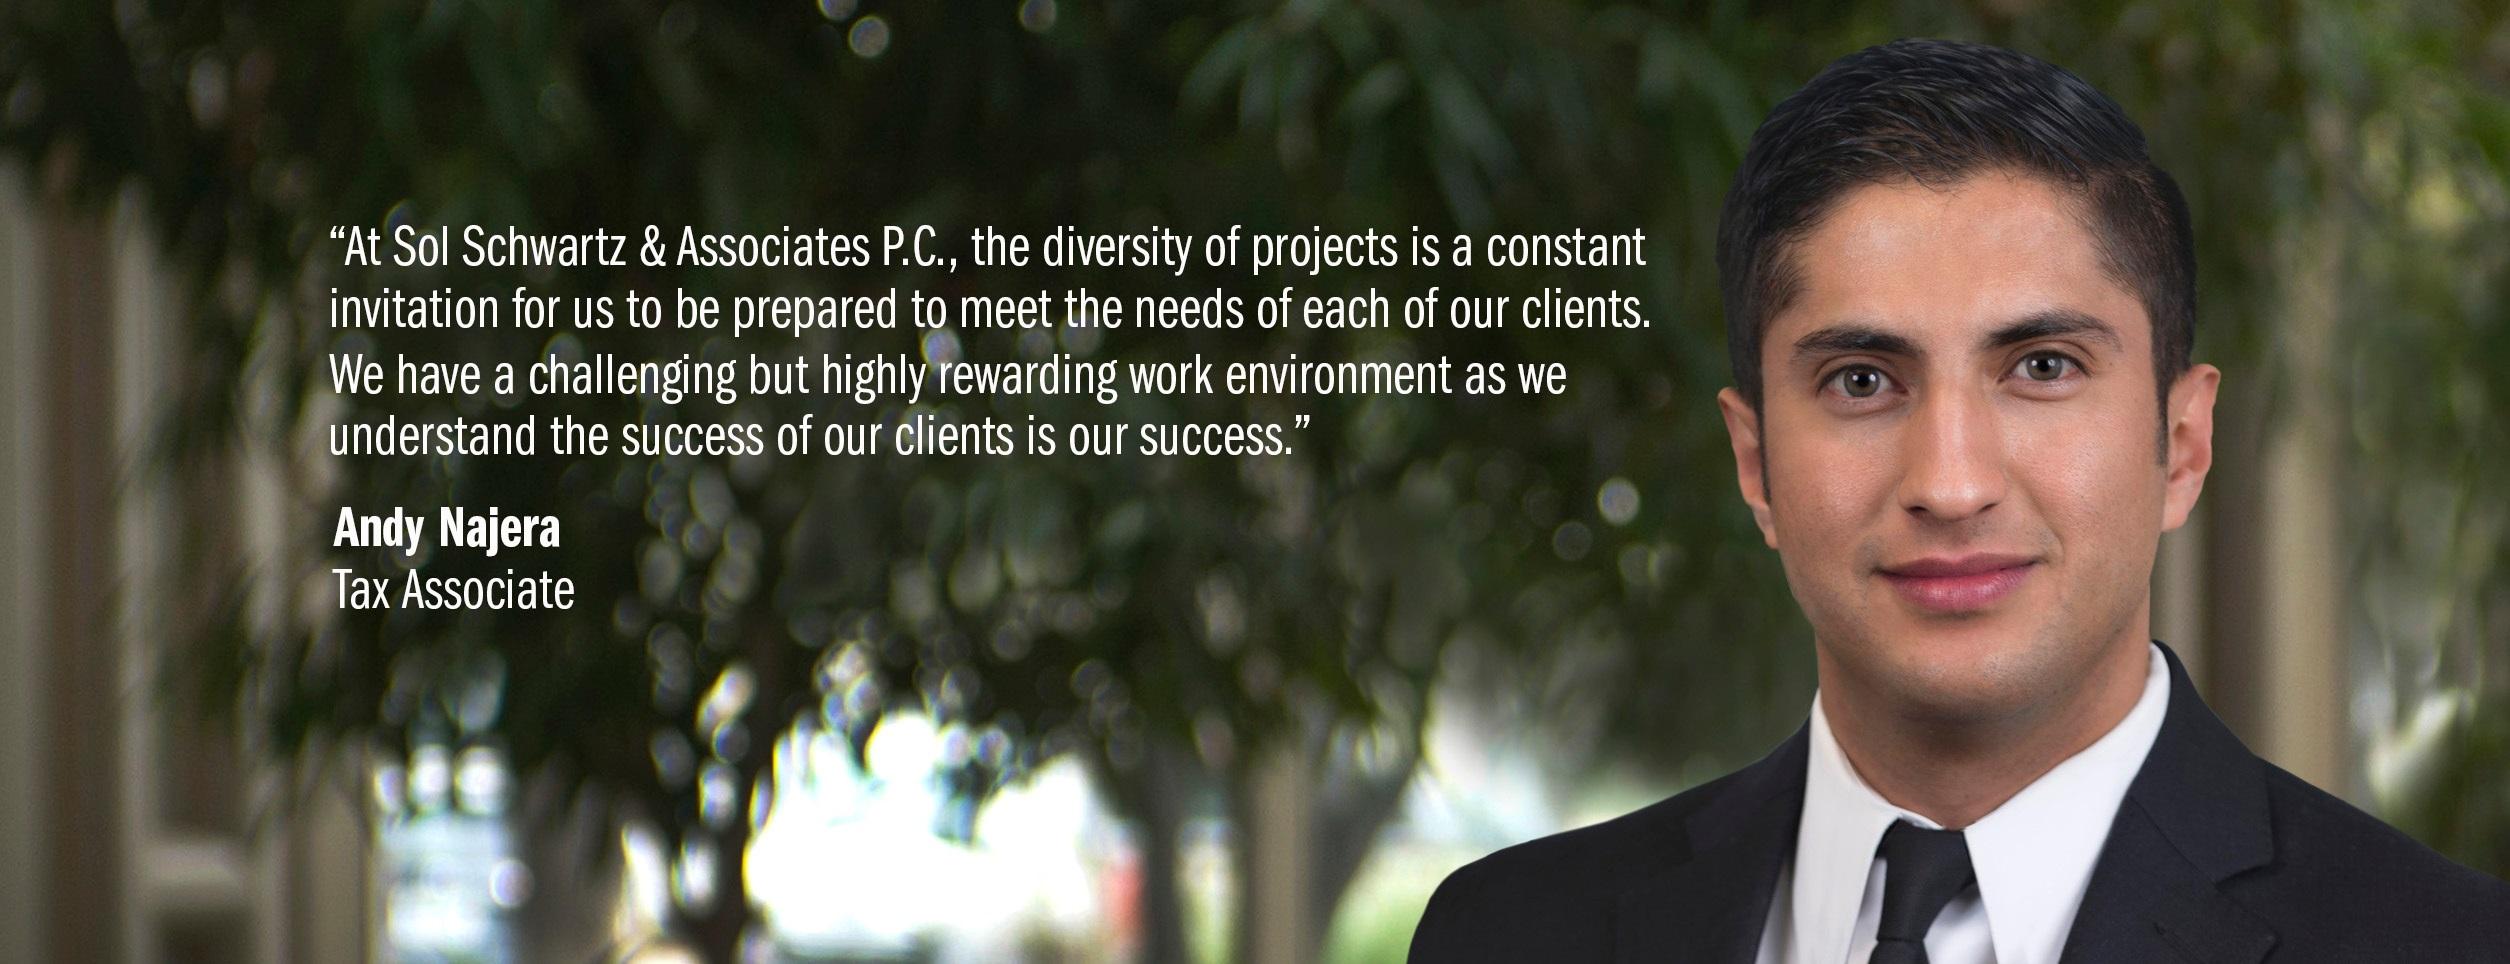 Sol Schwartz & Associates - Careers Testimonials